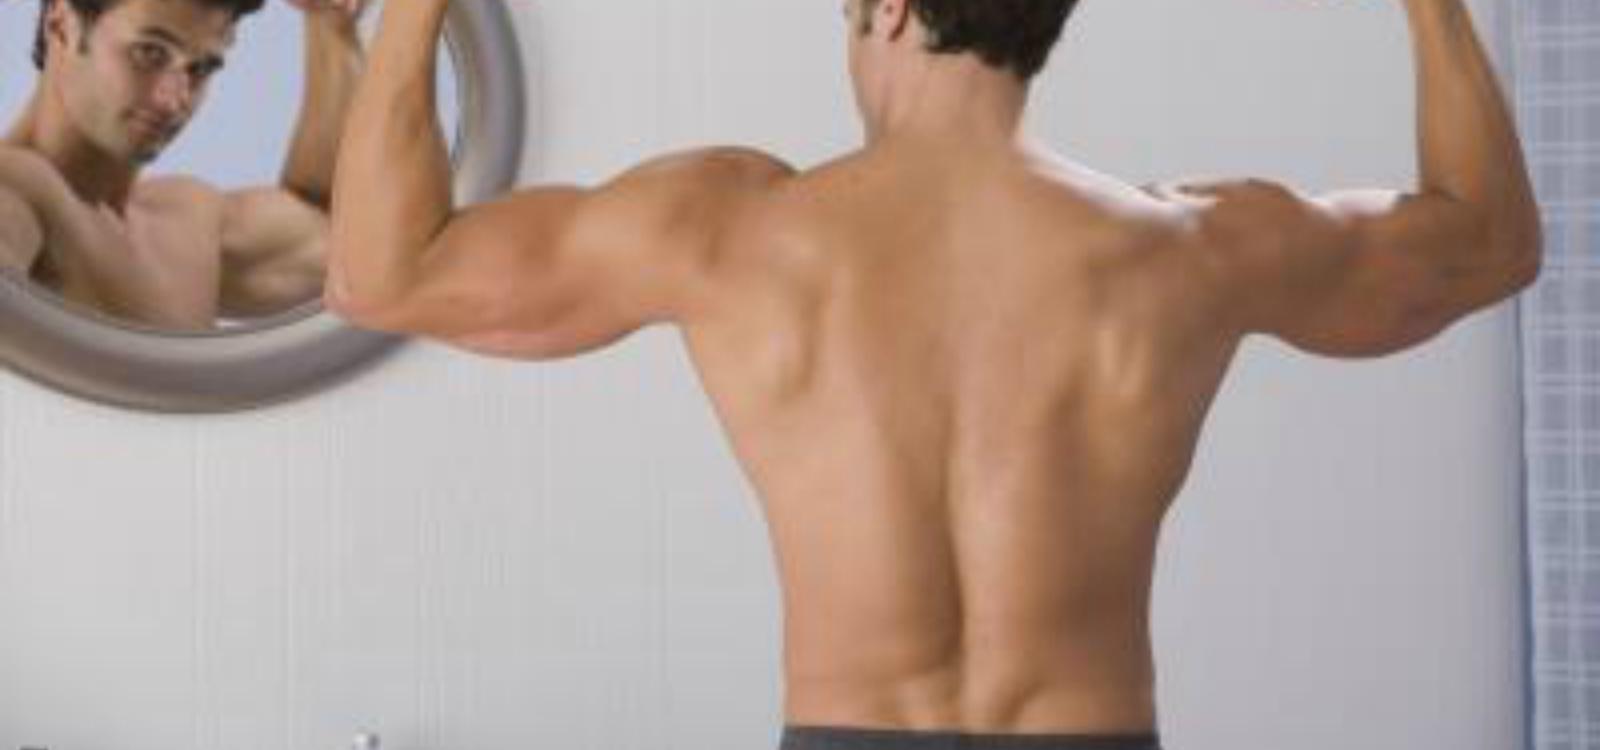 lat exercises mistakes